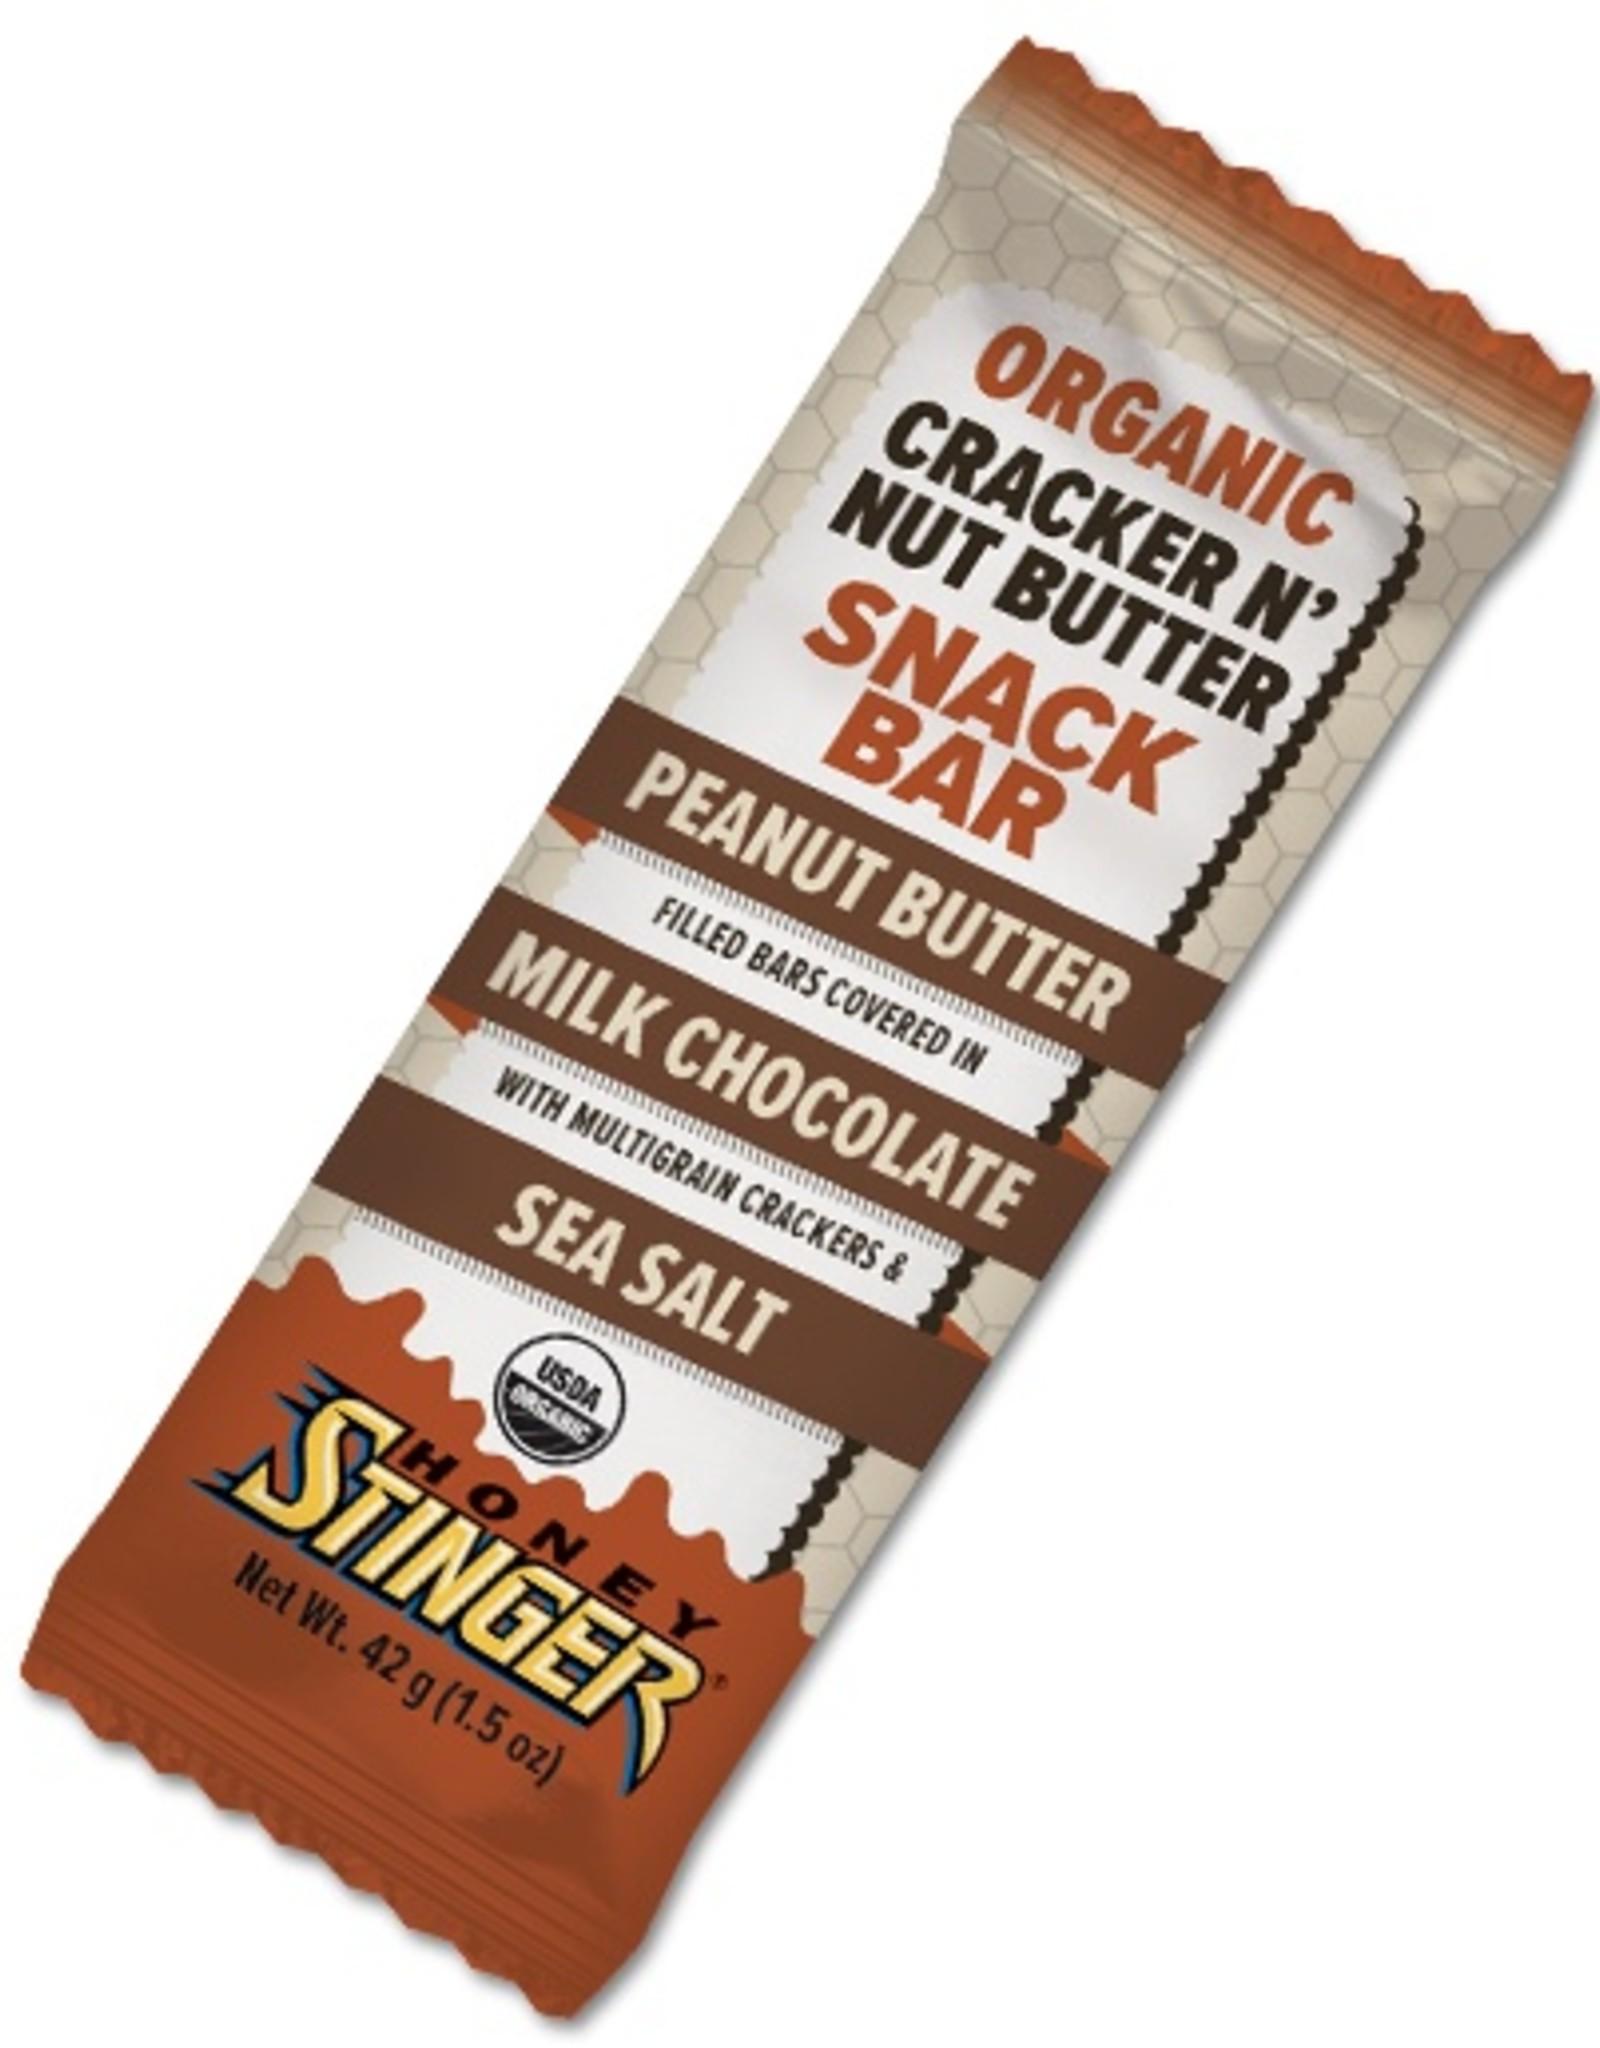 Honey Stinger Peanut Butter Milk Chocolate Cracker N' Nut Butter Bar